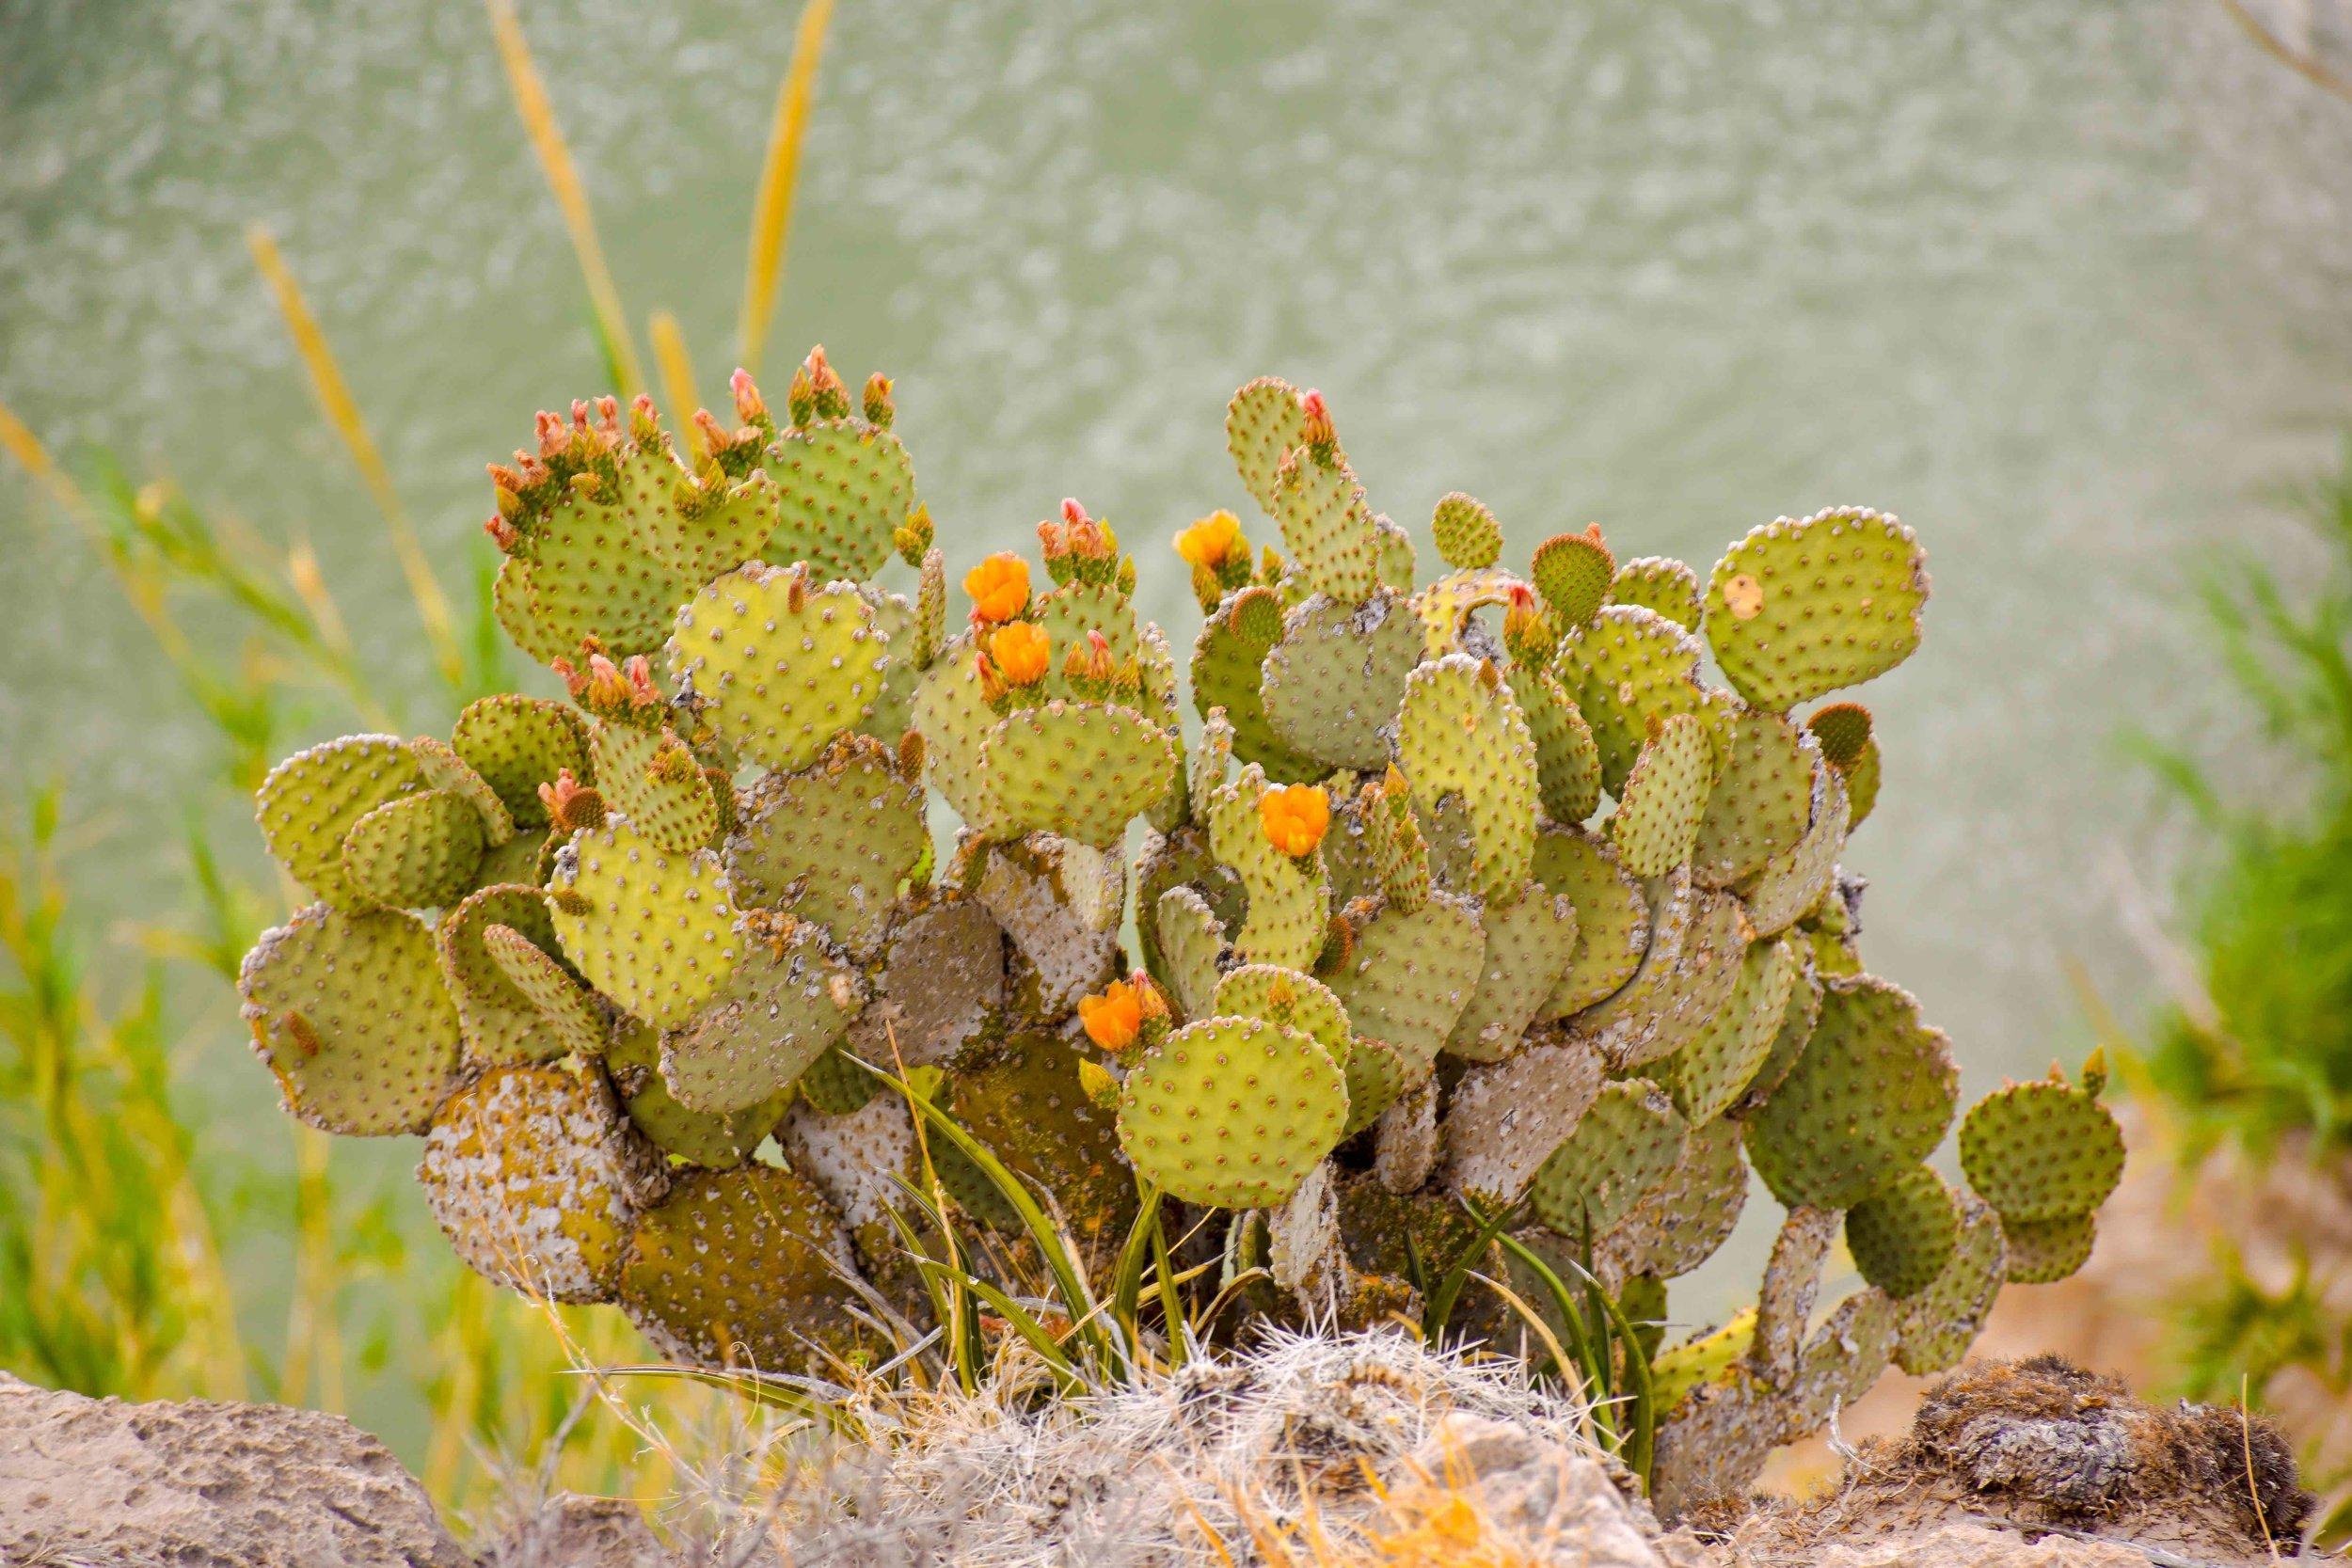 OPUNTIA CHLOROTICA - PANCAKE PRICKLY PEAR THRIVING IN THE SANTA ELENA CANYON